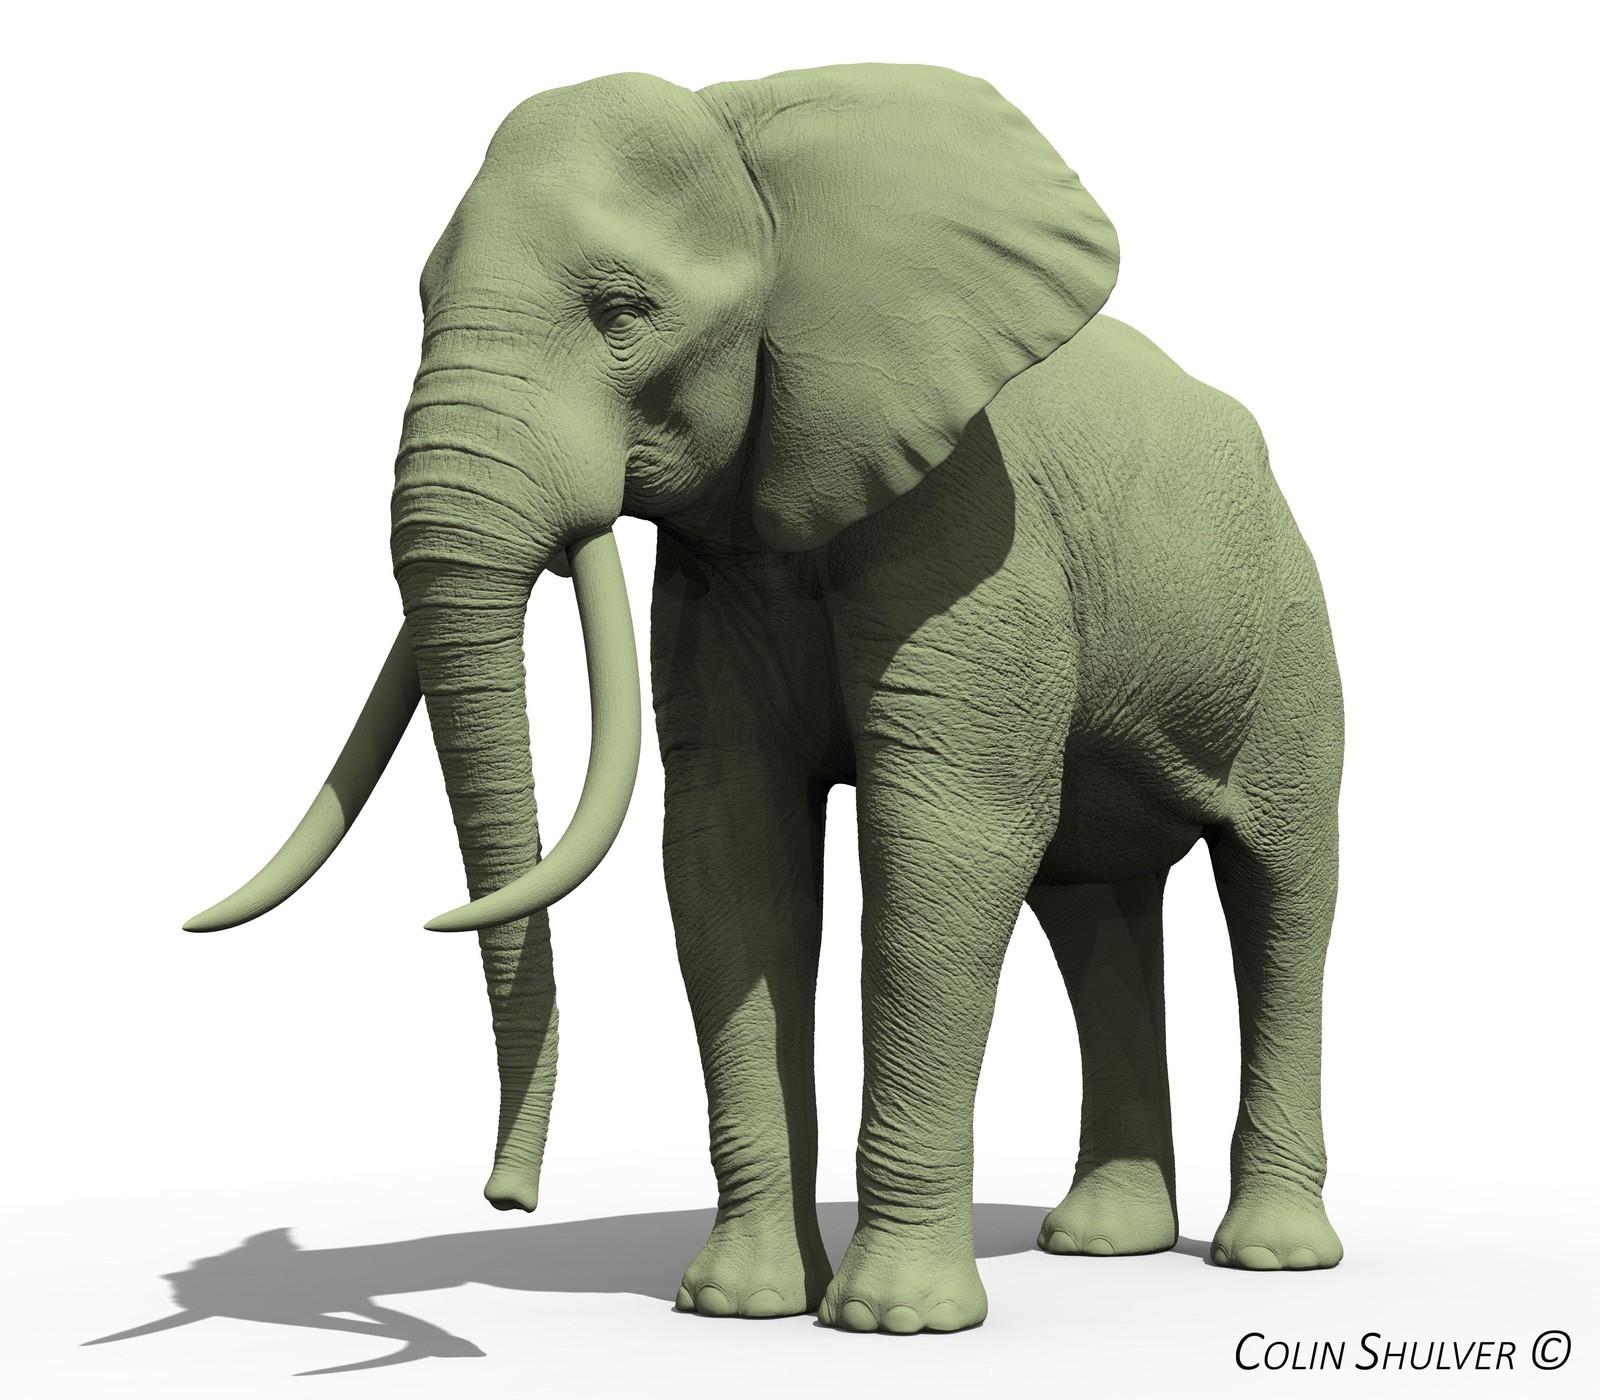 Personal Work - Elephants